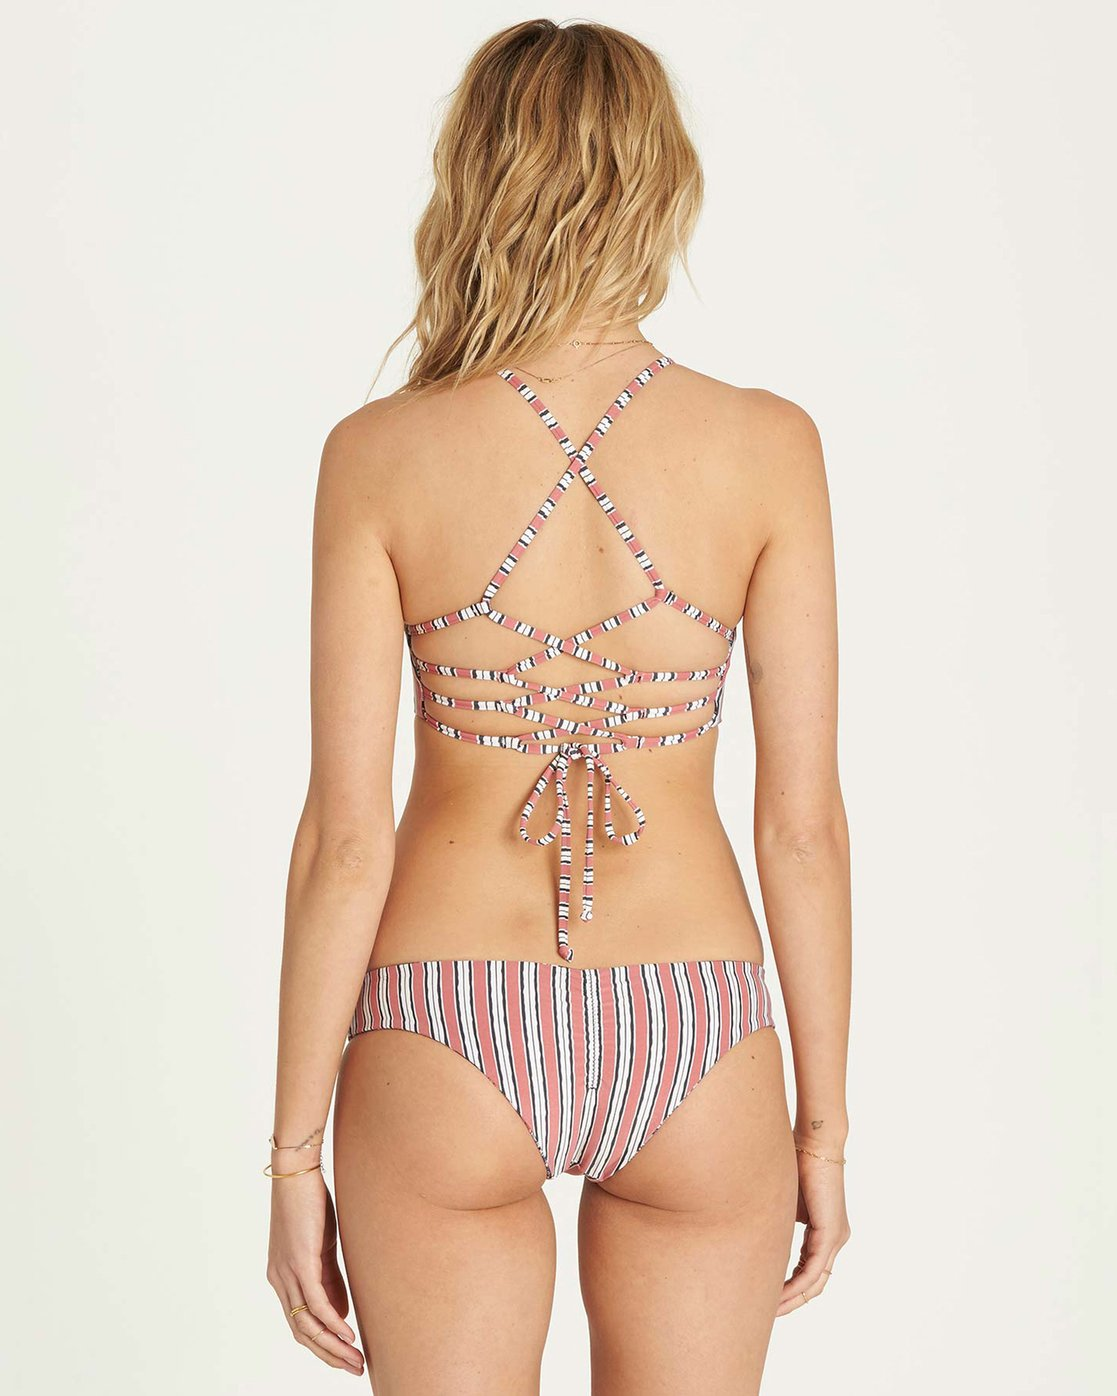 e4e4889519244c 3 Last Tribe High Neck Bikini Top XT14MLAS Billabong